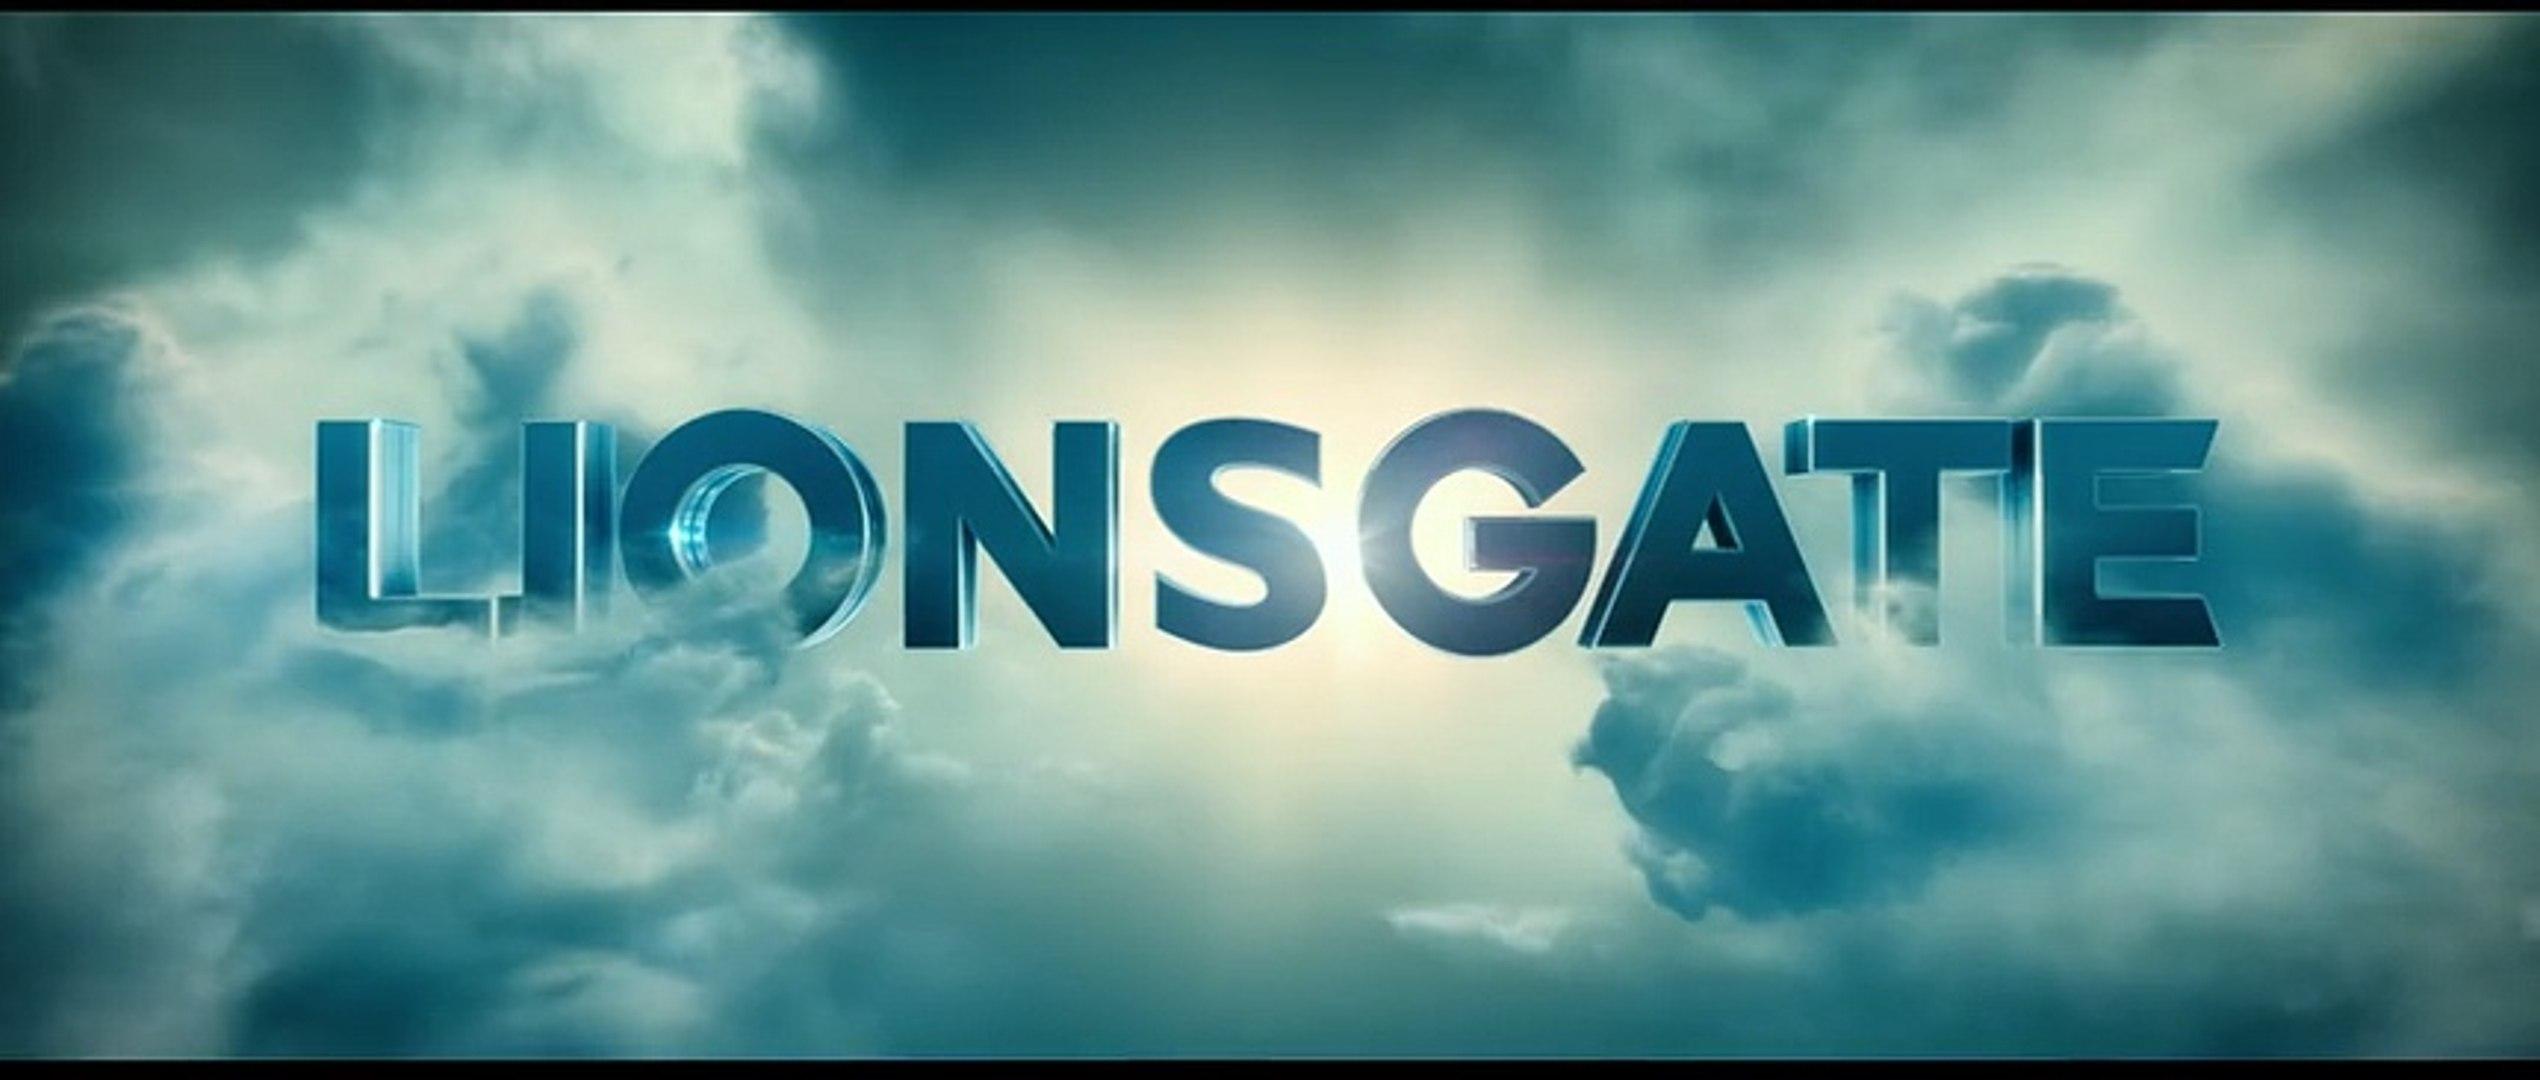 Nightlight (2015) Trailer - Trailer Addict